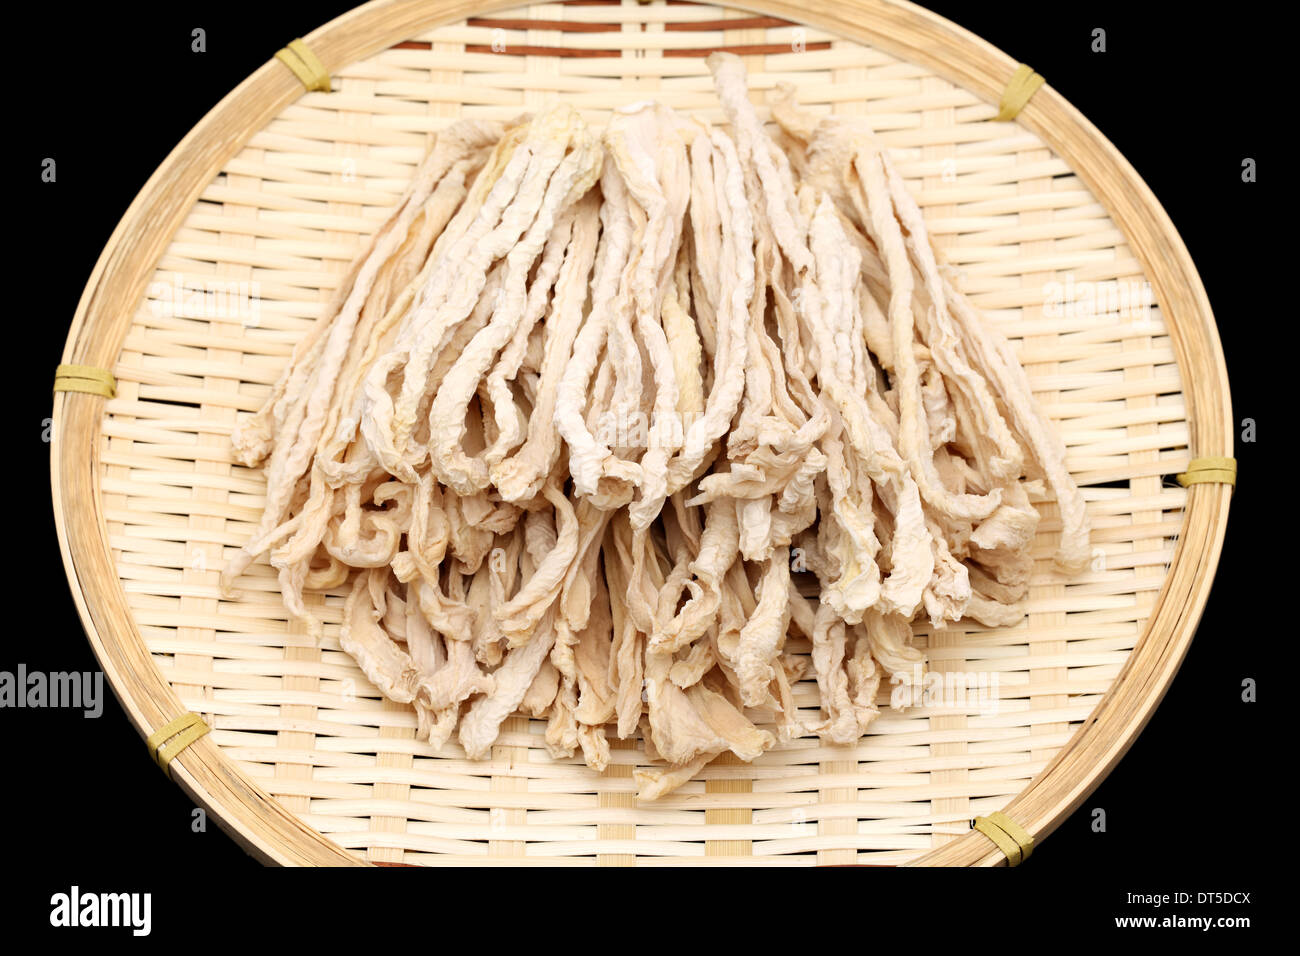 dried radish slice on bamboo basket, japanese food ingredient - Stock Image